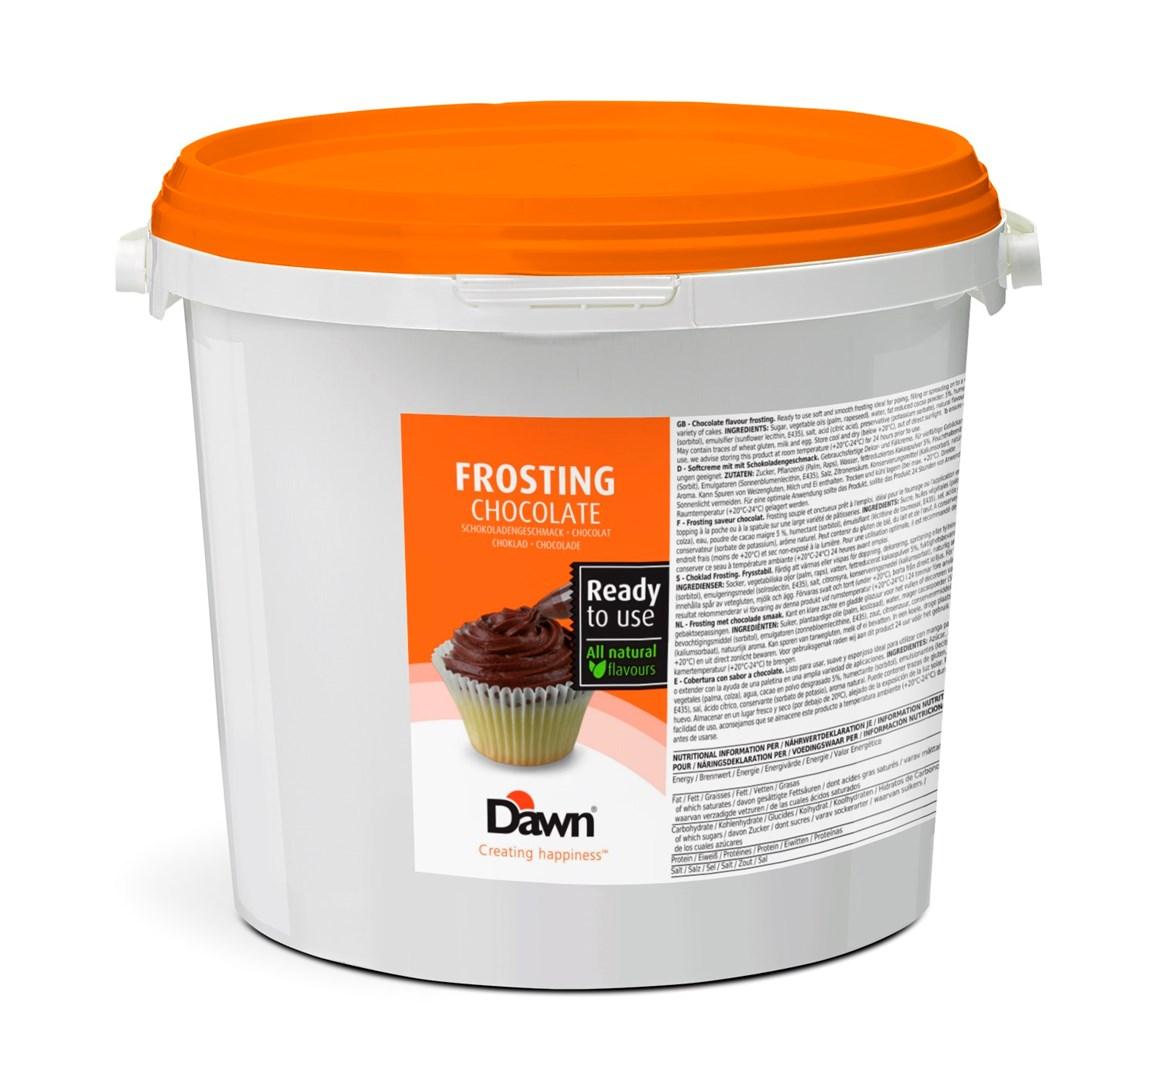 Productafbeelding Dawn Frosting met chocolade smaak 6 kg emmer